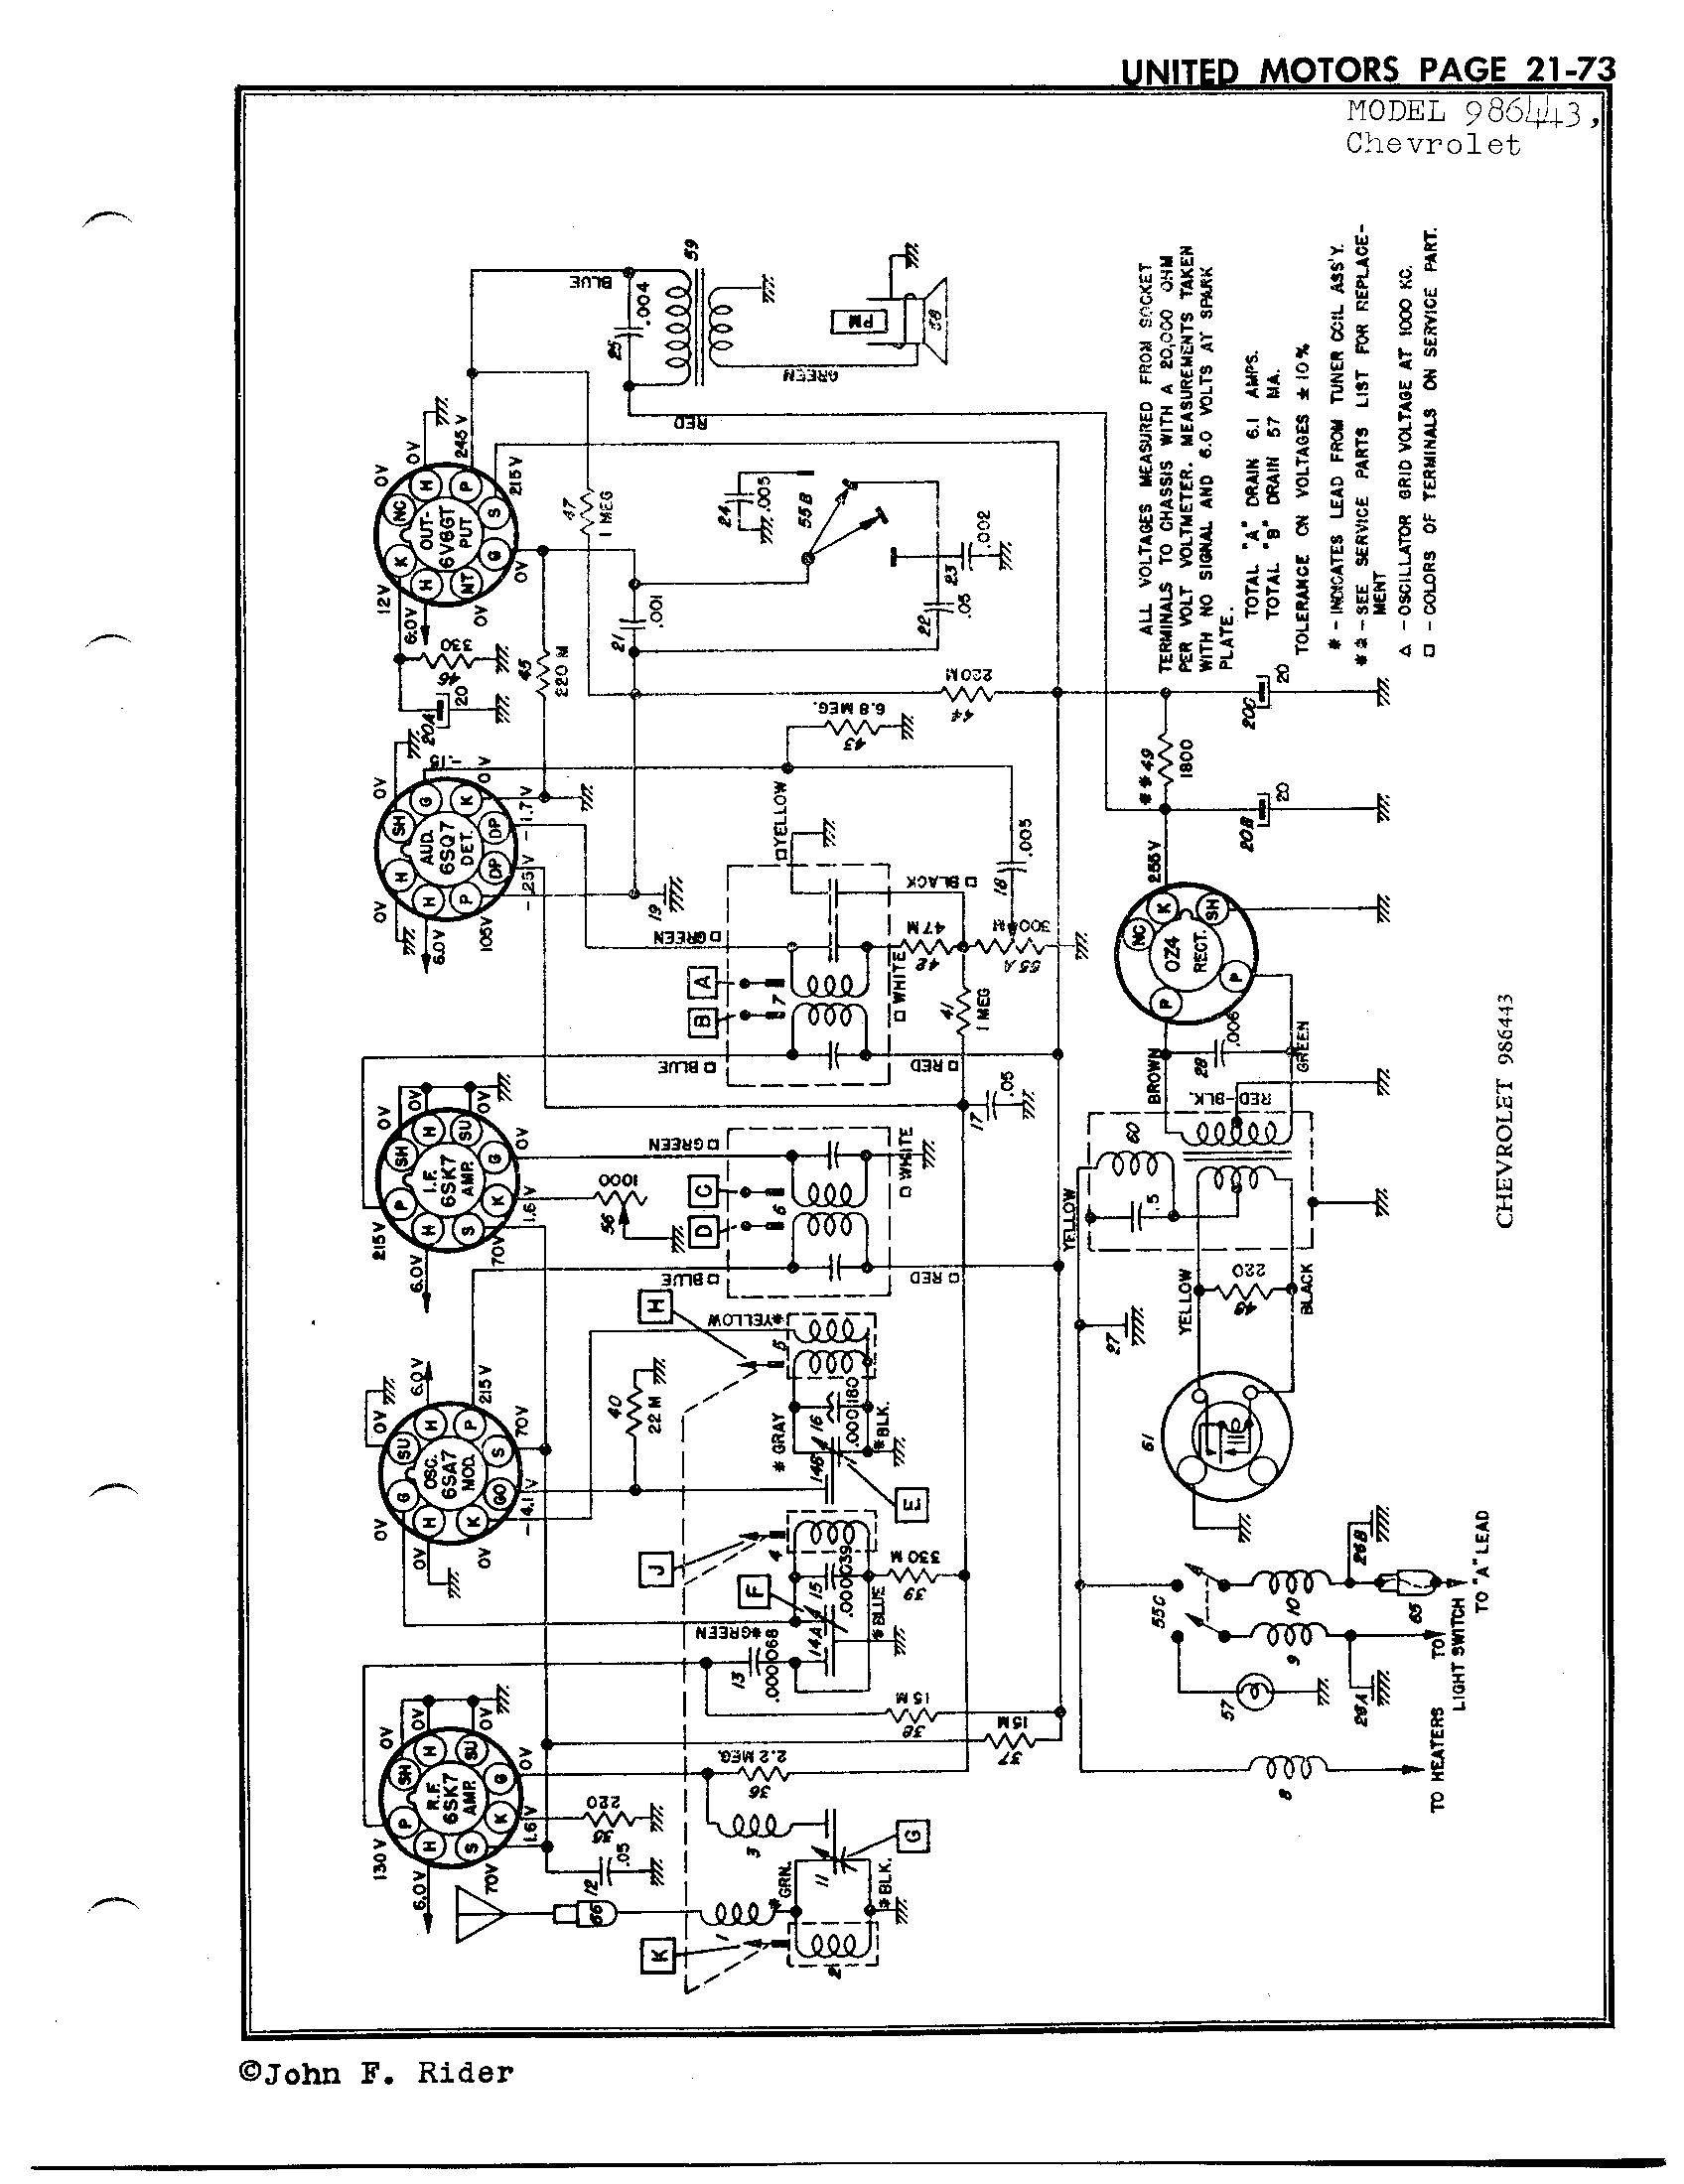 Delco Wiring Diagram